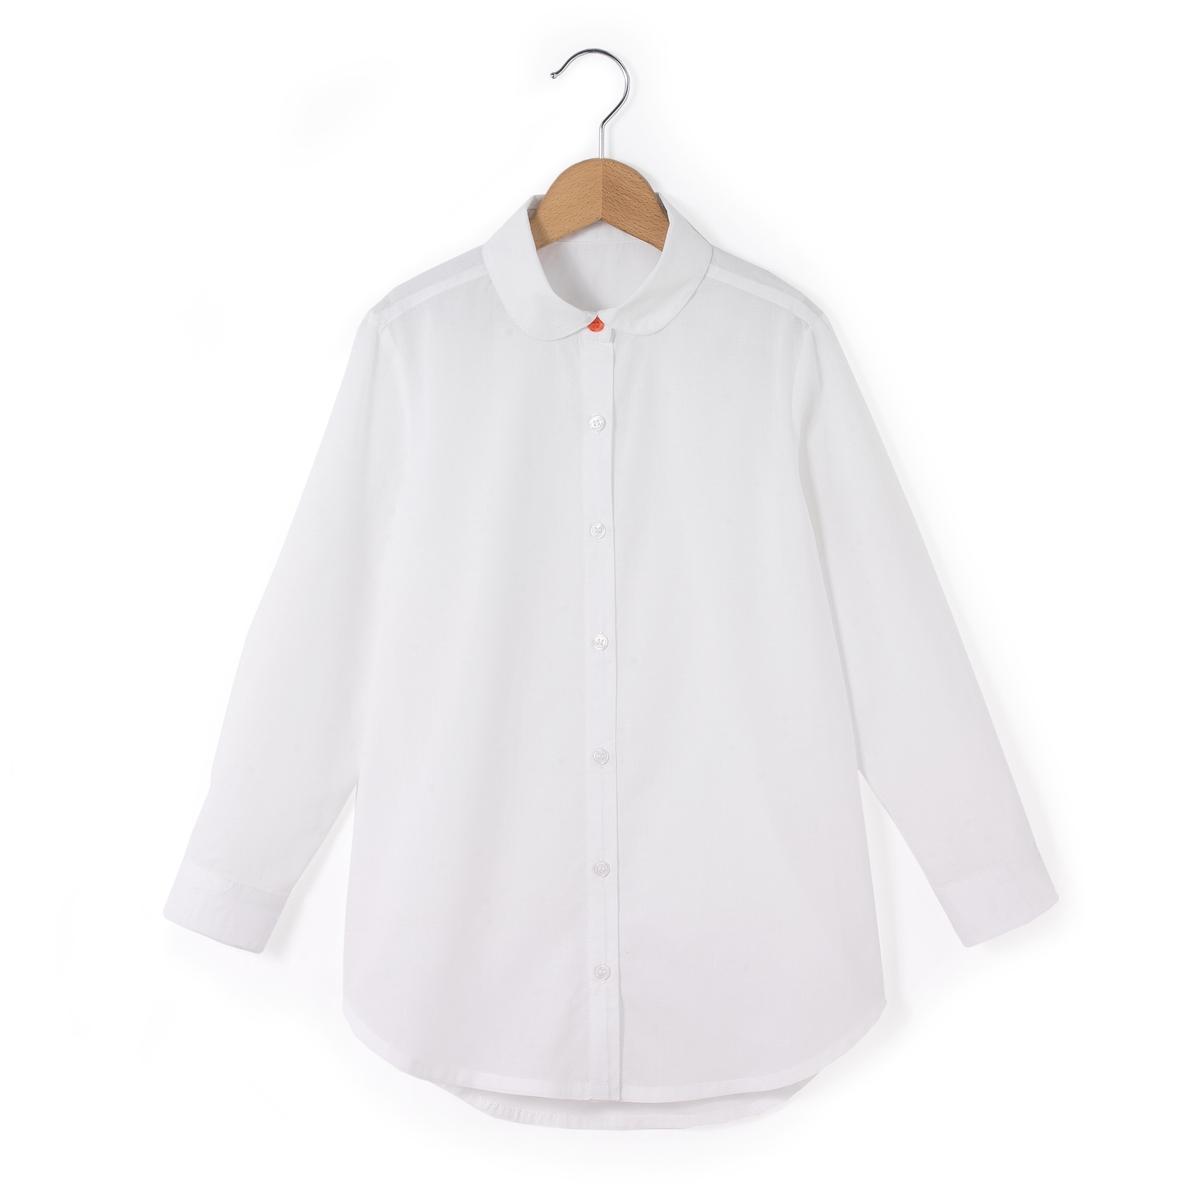 Блузка с рукавами с отворотами 3-12 лет